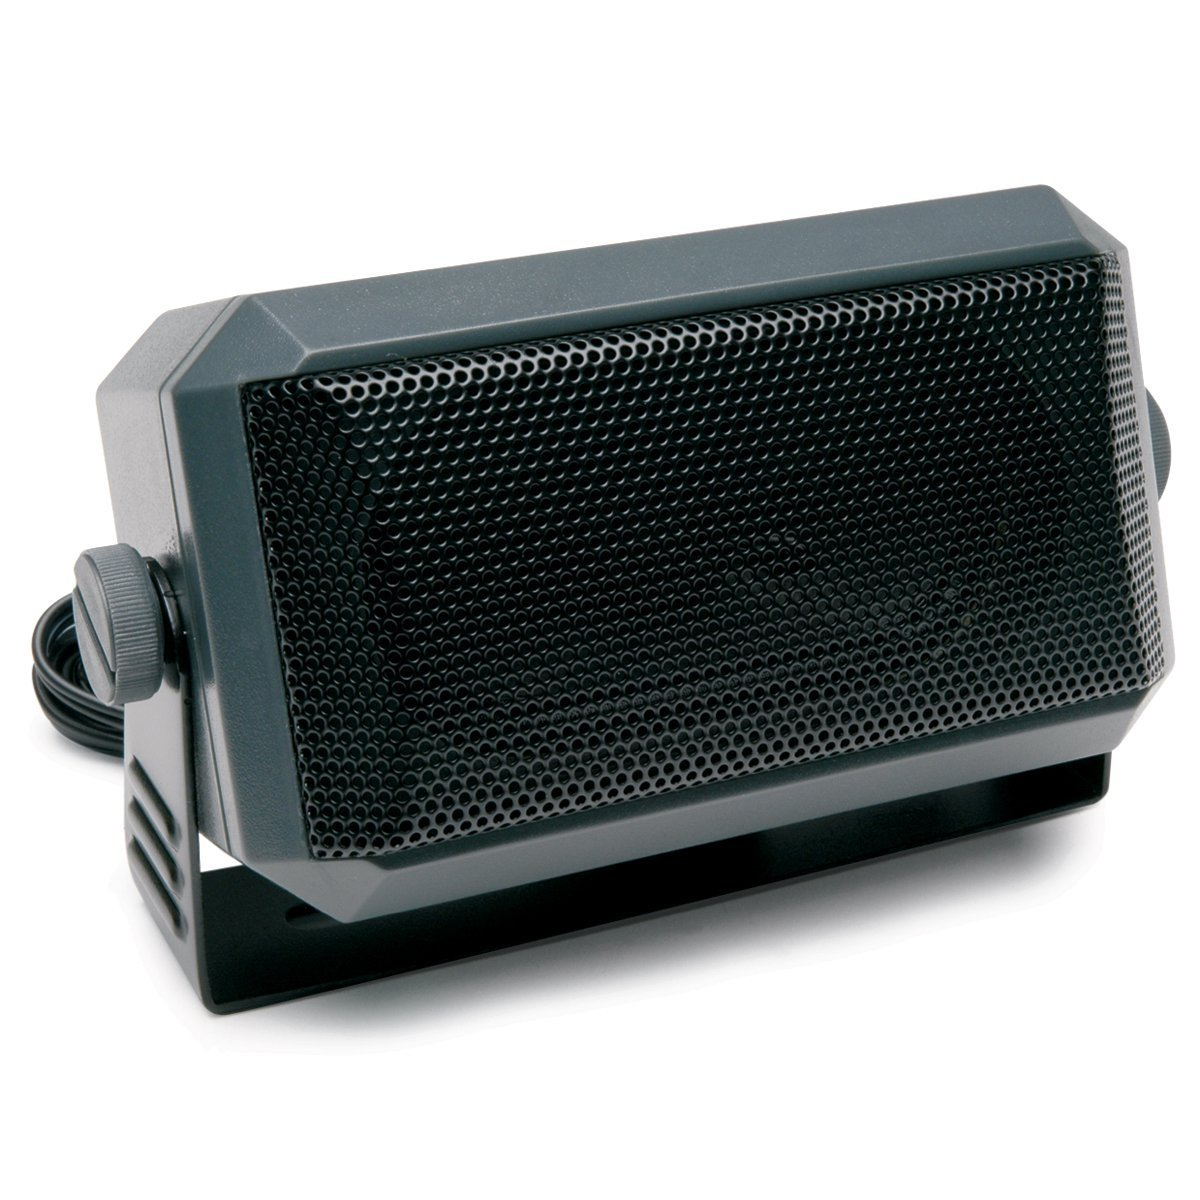 TOPMYS TM-ES604 CB Radio Speaker 8ohm 5W CB Extension Speaker with Swivel Bracket 1.85m cable 3.5mm Mono Plug